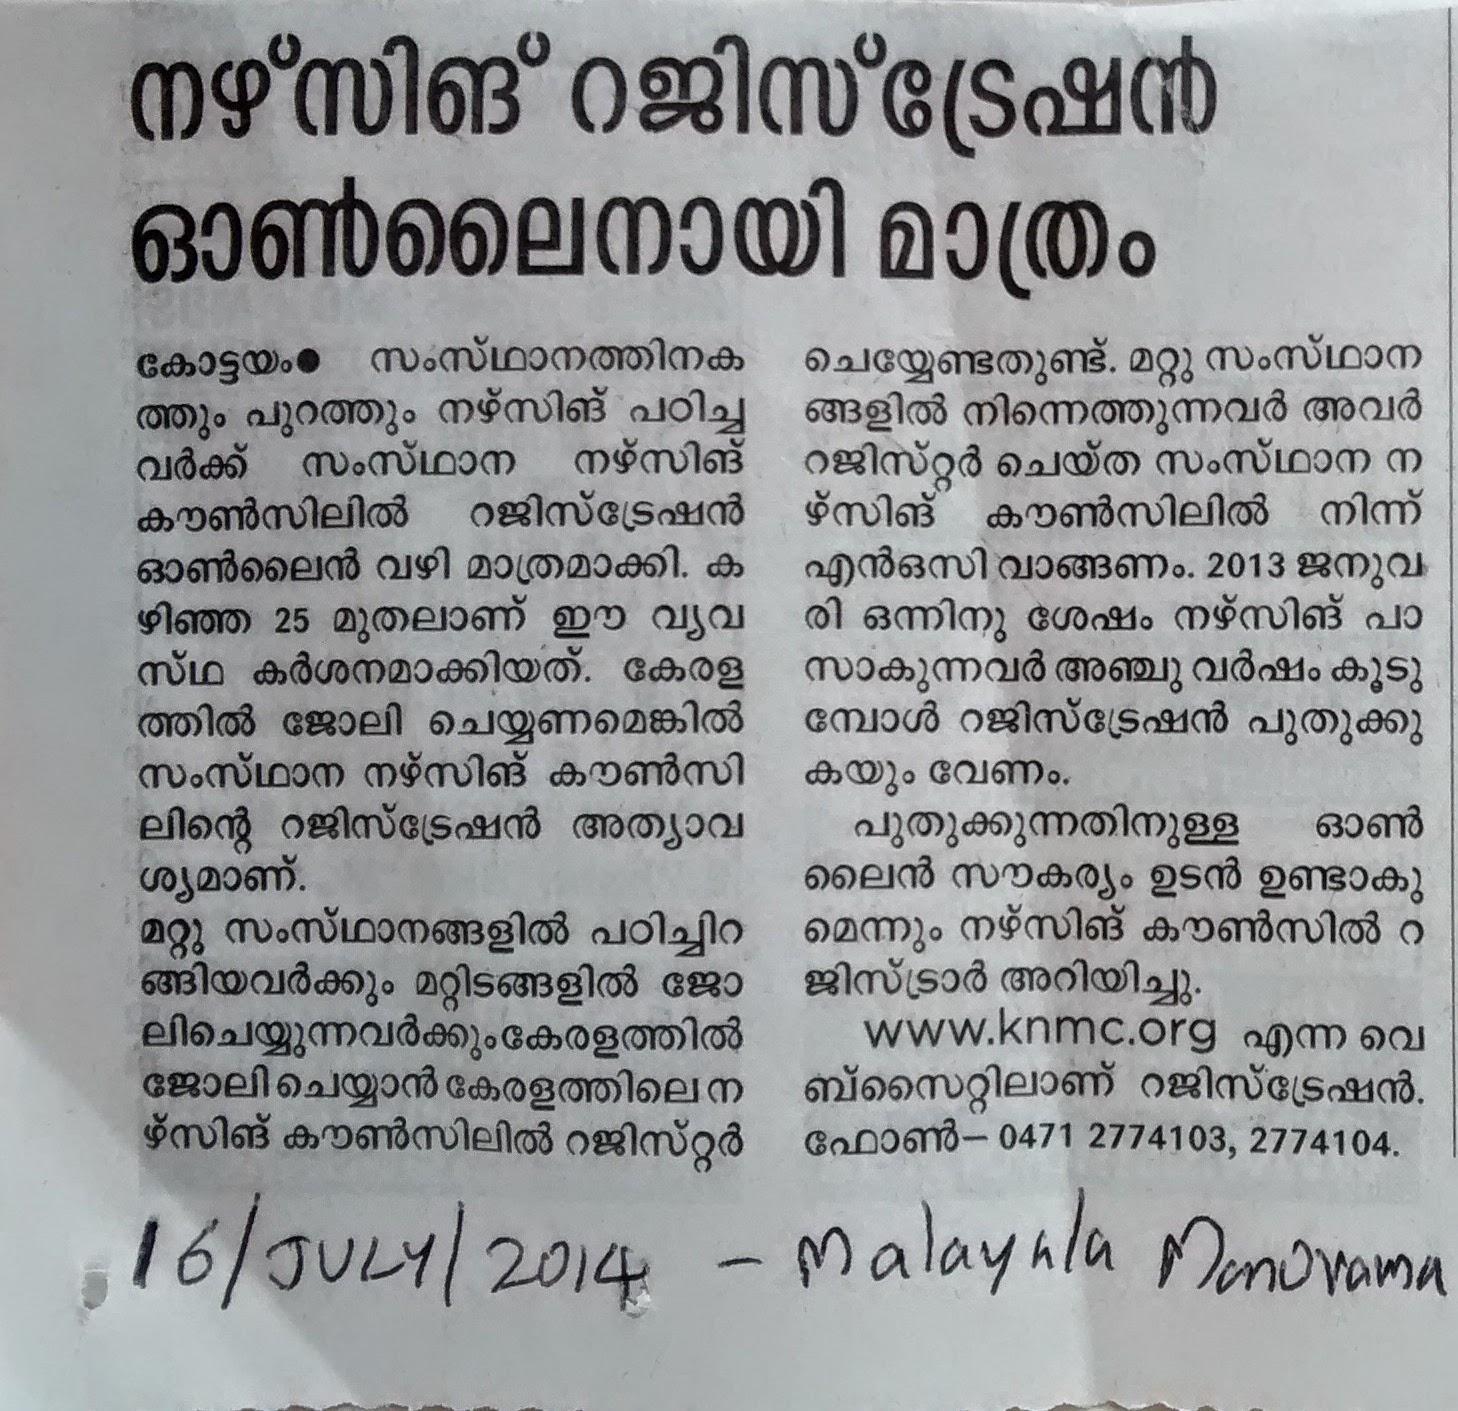 Kerala nursing council registration process 1 online registrationupdate on 18 july 2014 xflitez Gallery